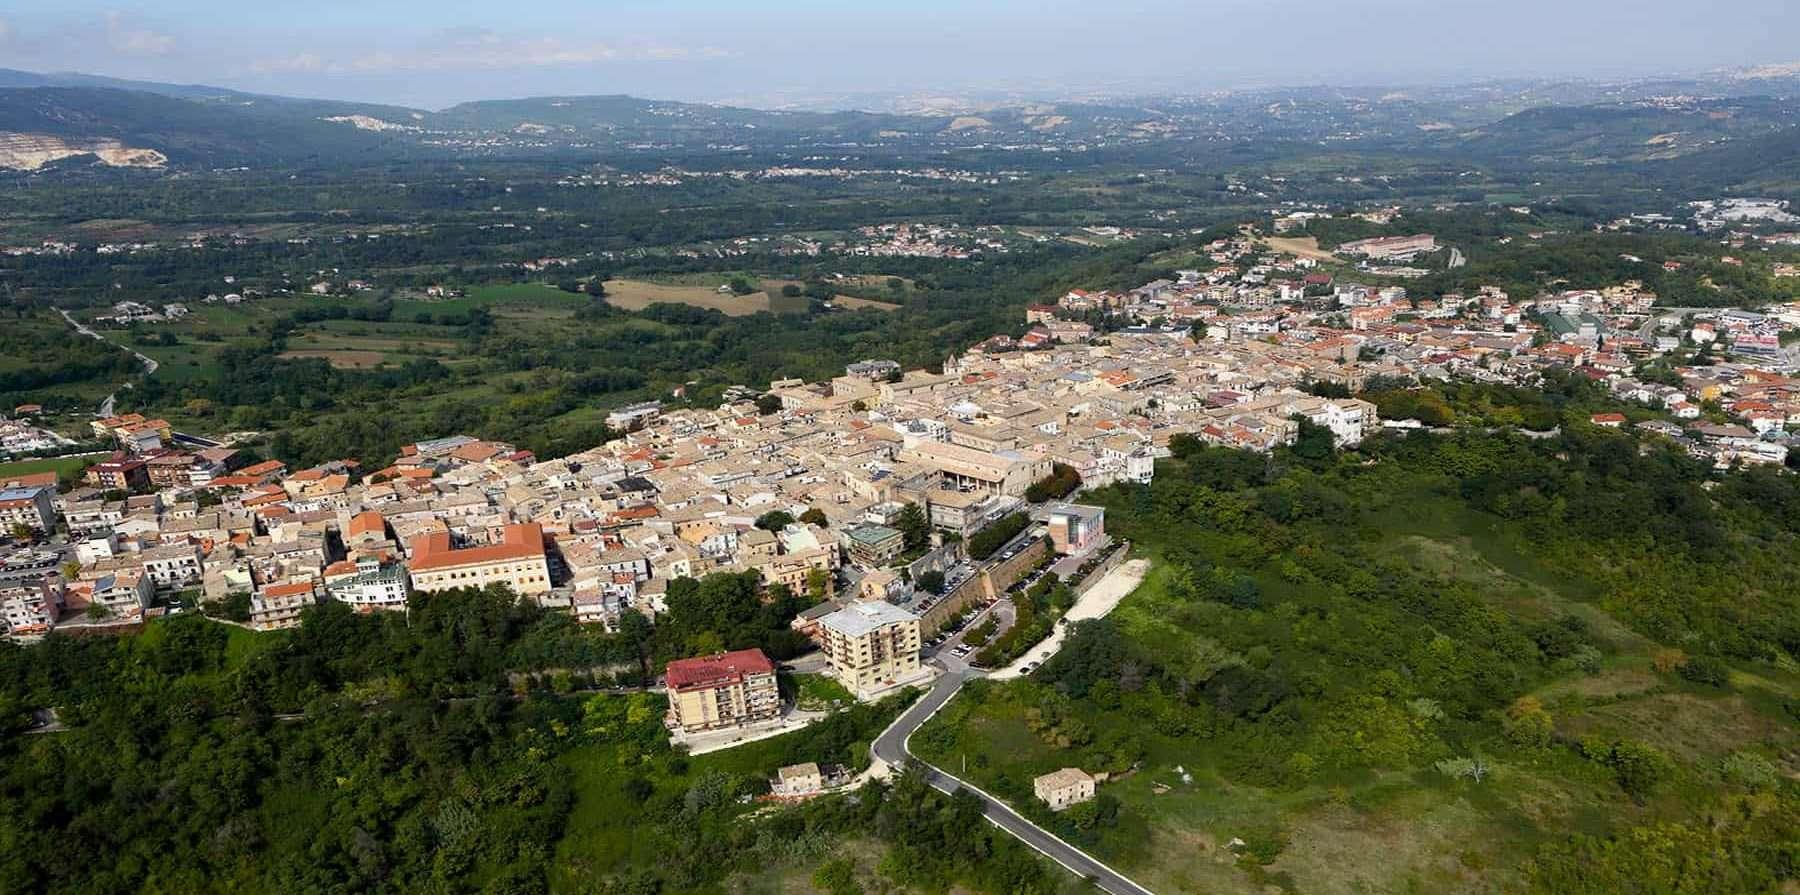 Guardiagrele - © Vaghis - viaggi & turismo Italia - Tutti i diritti riservati